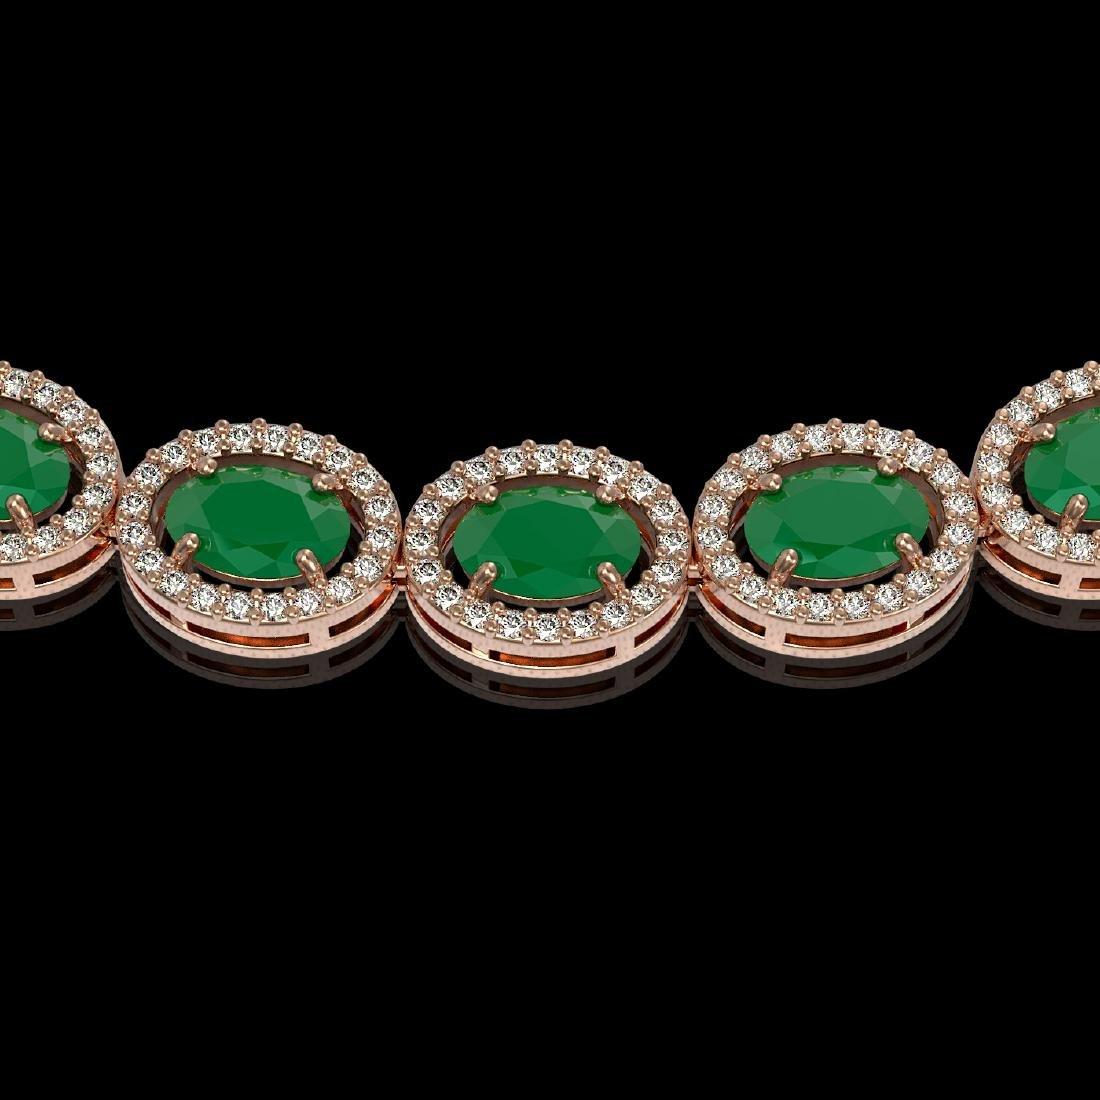 34.11 CTW Emerald & Diamond Halo Necklace 10K Rose Gold - 3